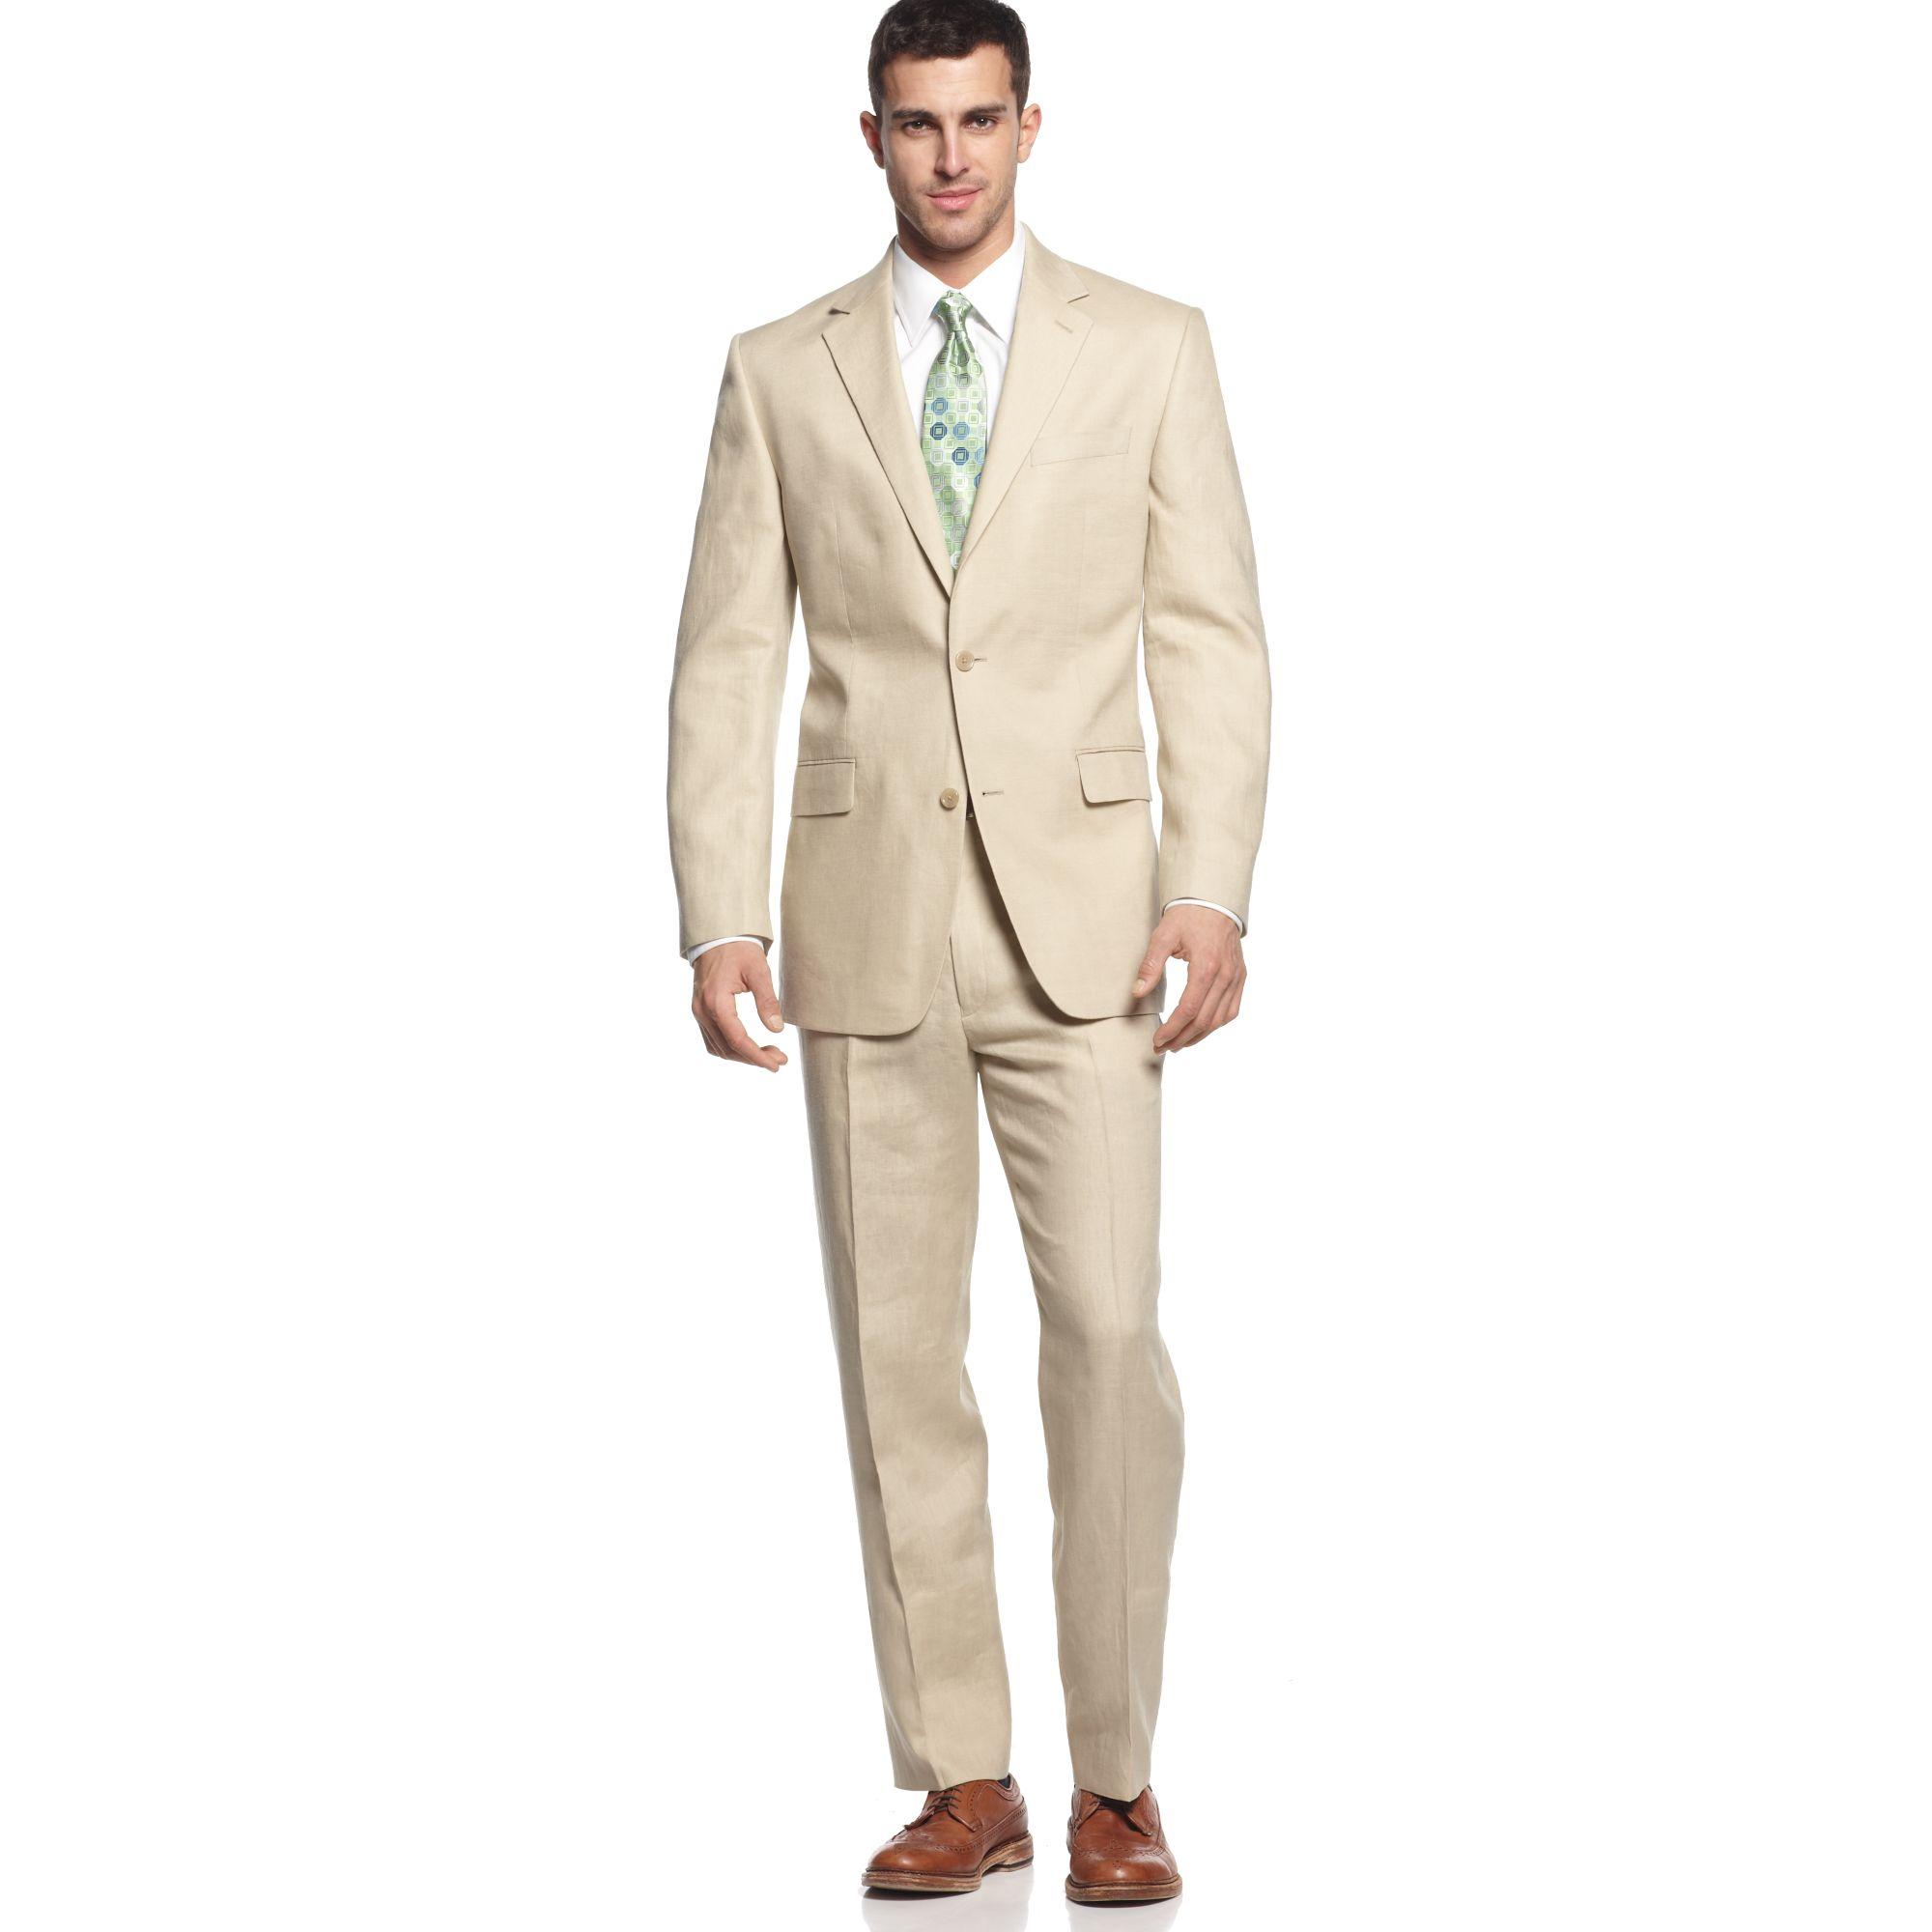 Lyst - Michael Kors Natural Linen Suit in Natural for Men